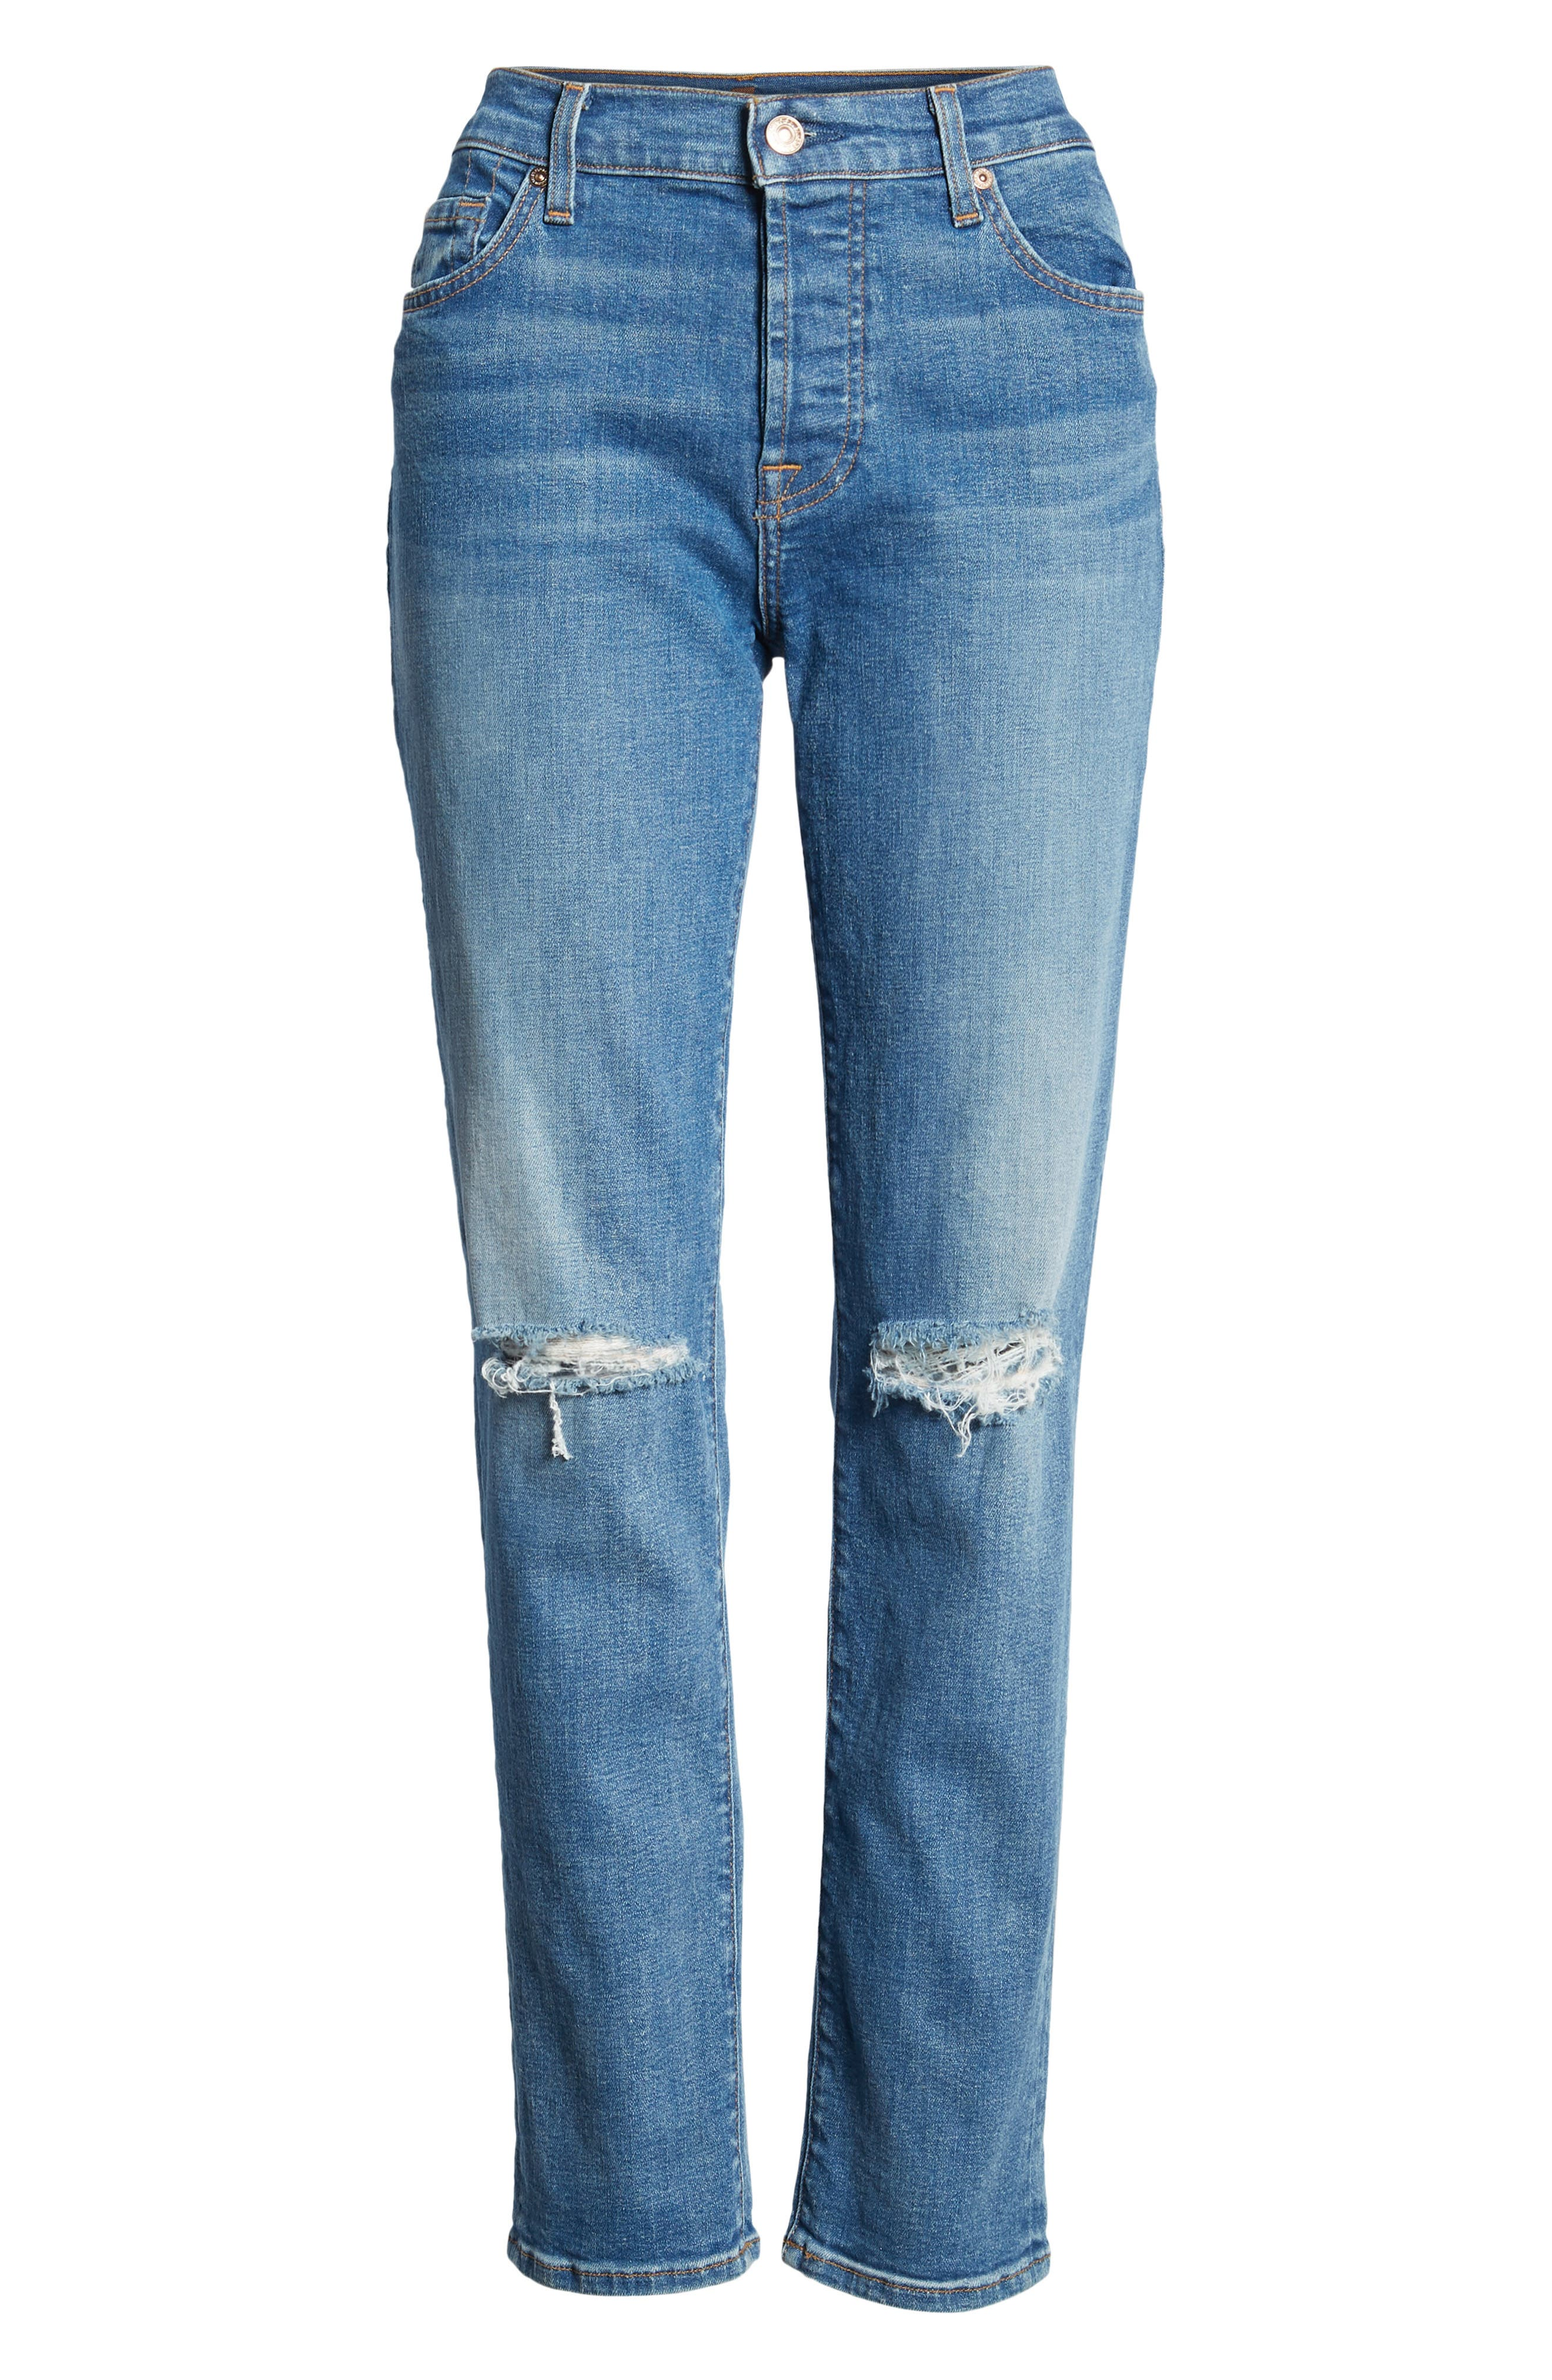 Josefina Ripped Boyfriend Jeans,                             Alternate thumbnail 7, color,                             Heritage Artwalk 2